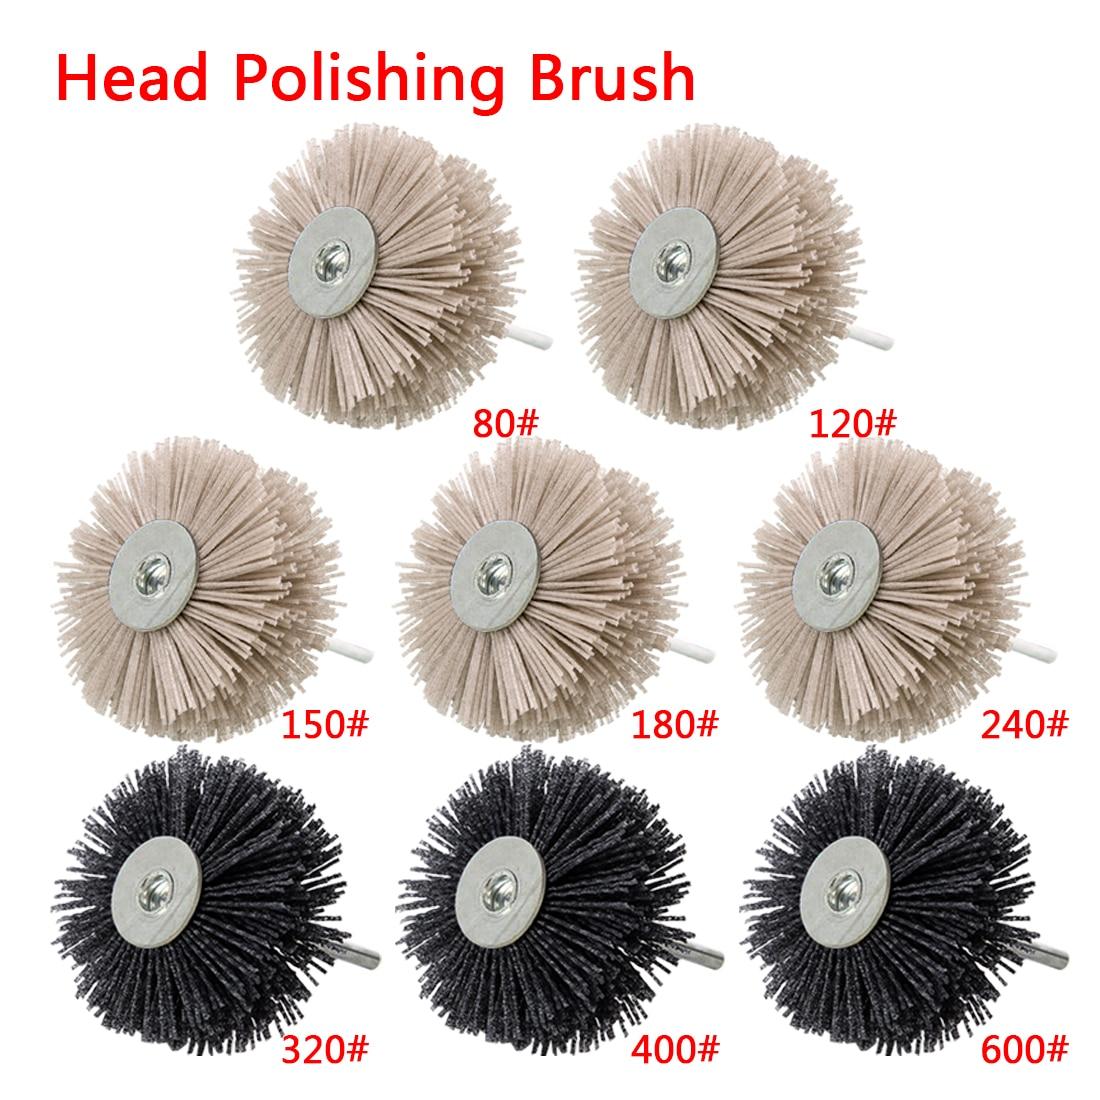 Grinding Flower Head Abrasive Nylon Wheel Brush Woodwork Polishing Brush Bench Grinder For Wood Furniture Mahogany